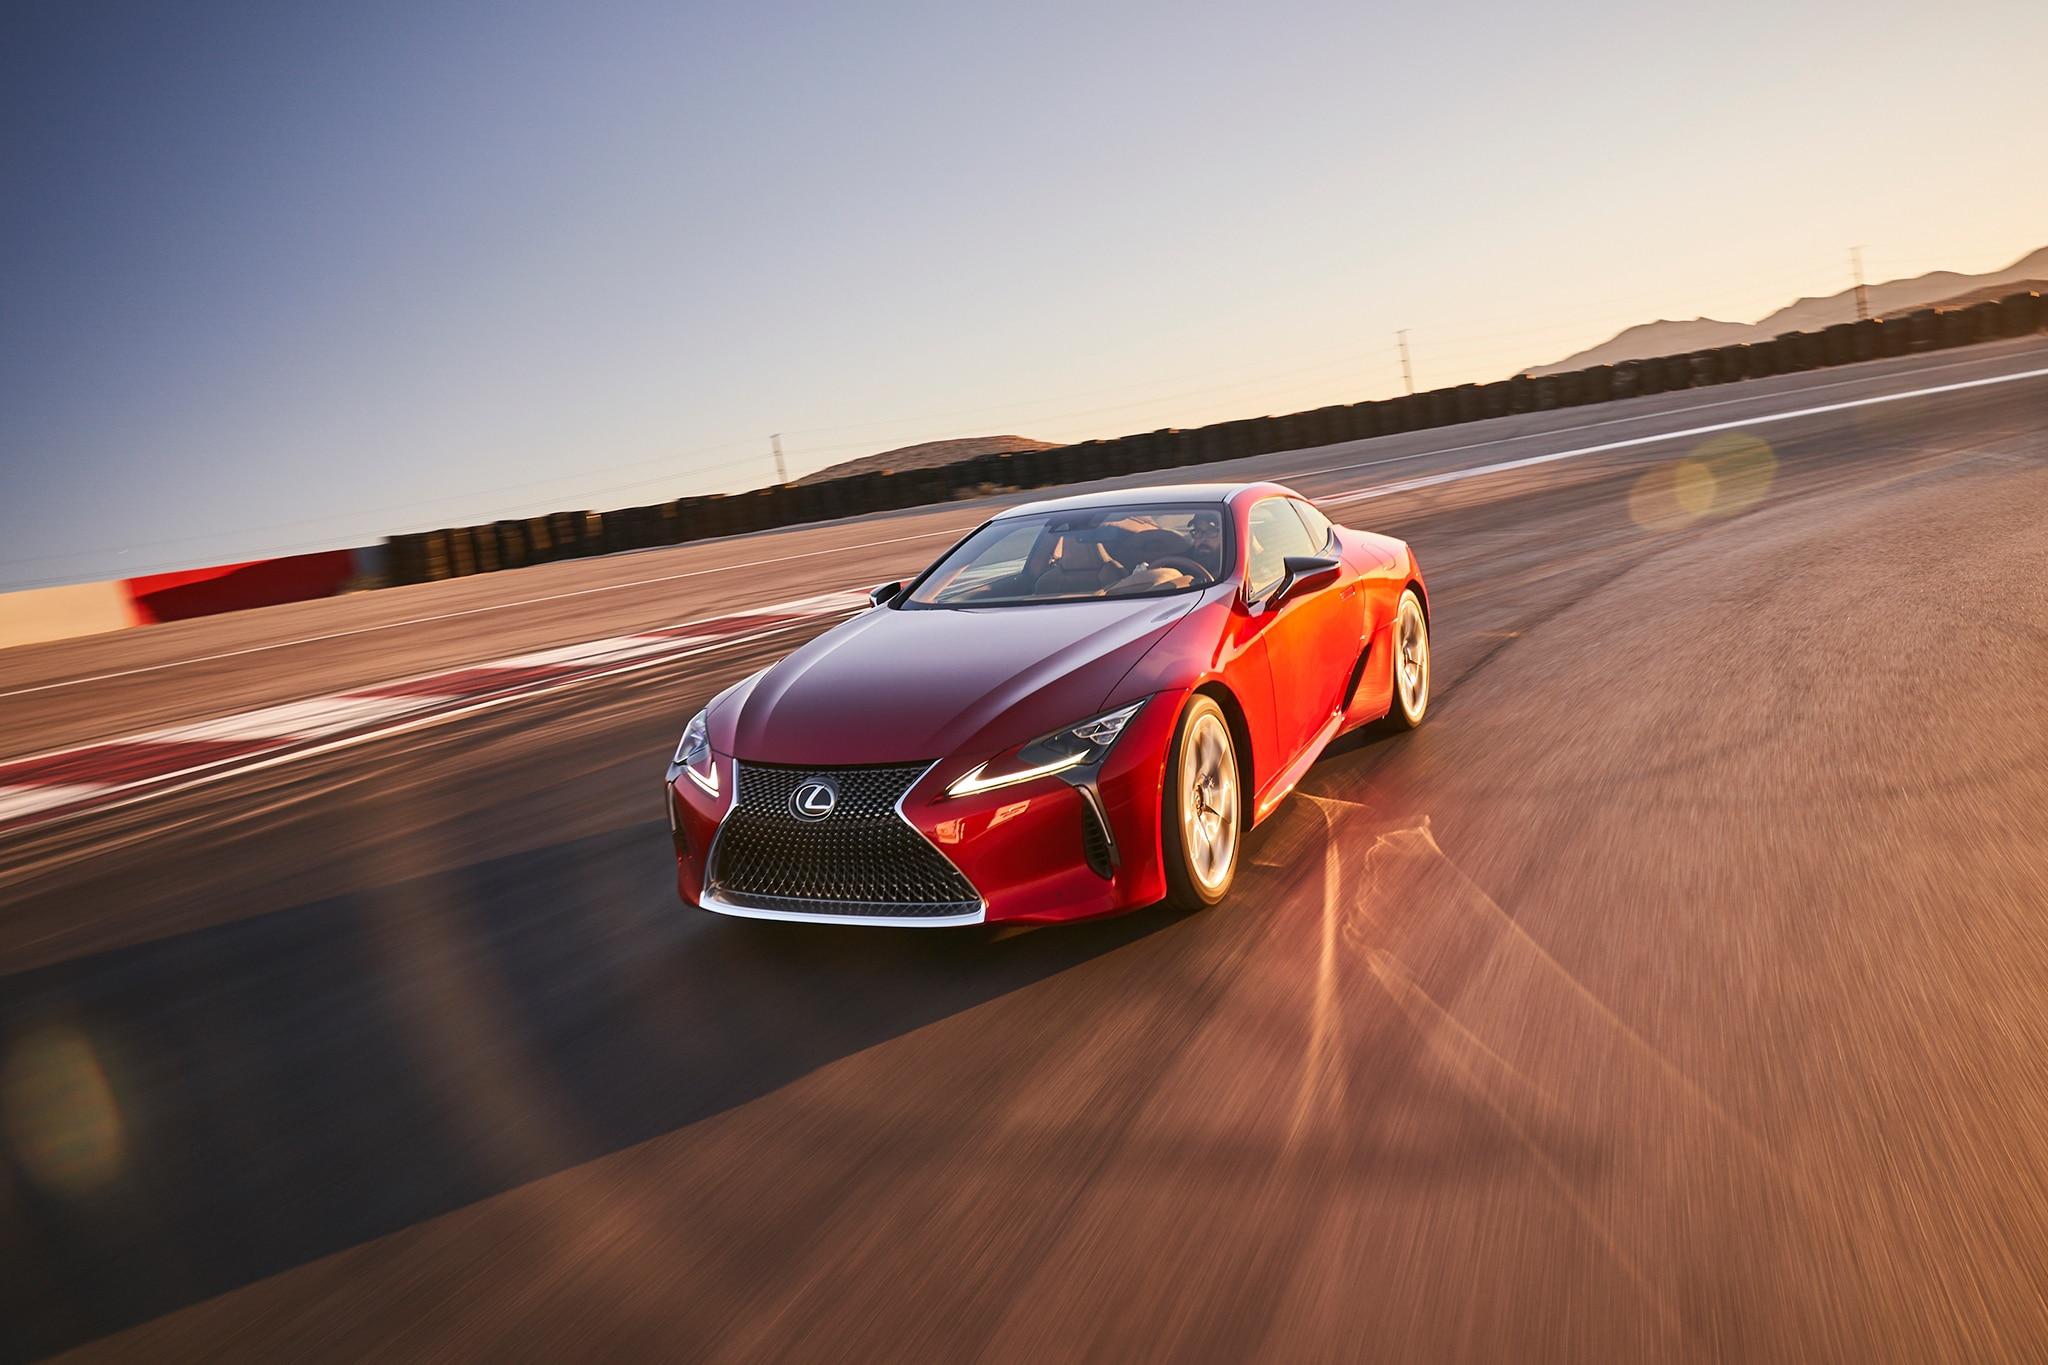 http://st.automobilemag.com/uploads/sites/11/2018/03/2018-Lexus-LC-500-All-Stars-Contender-25.jpg